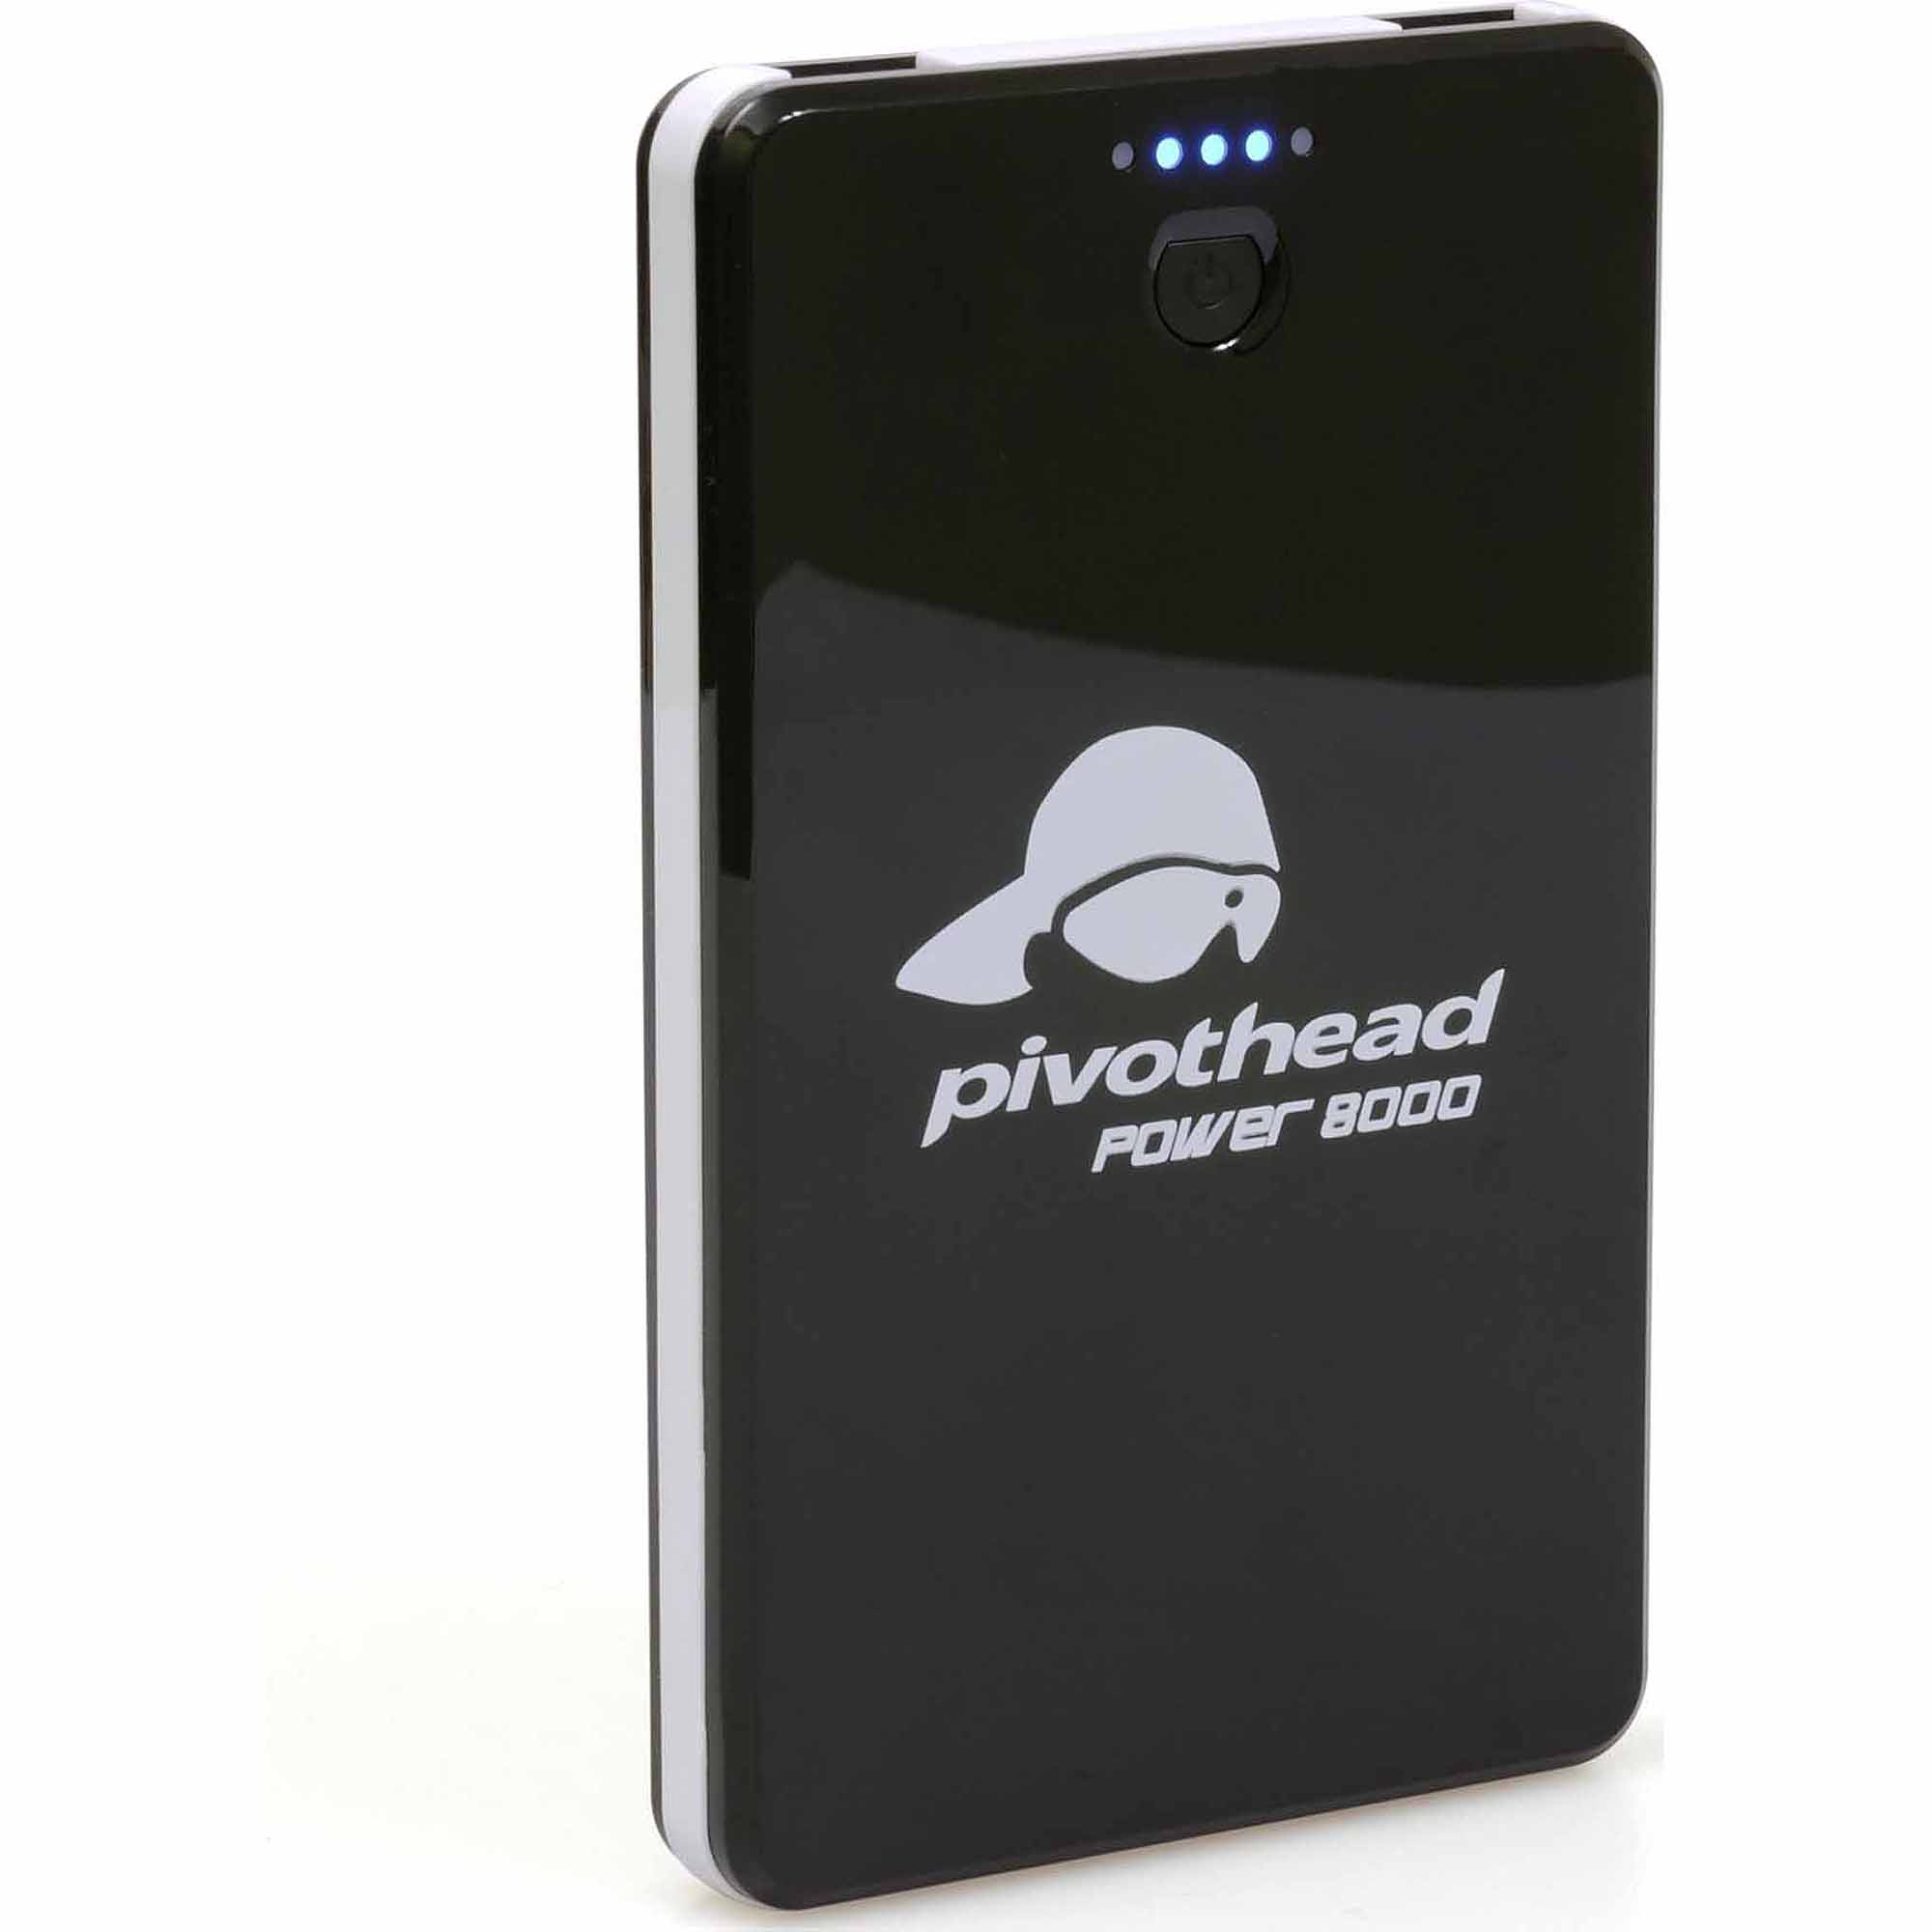 Pivothead Power Refuel 8000